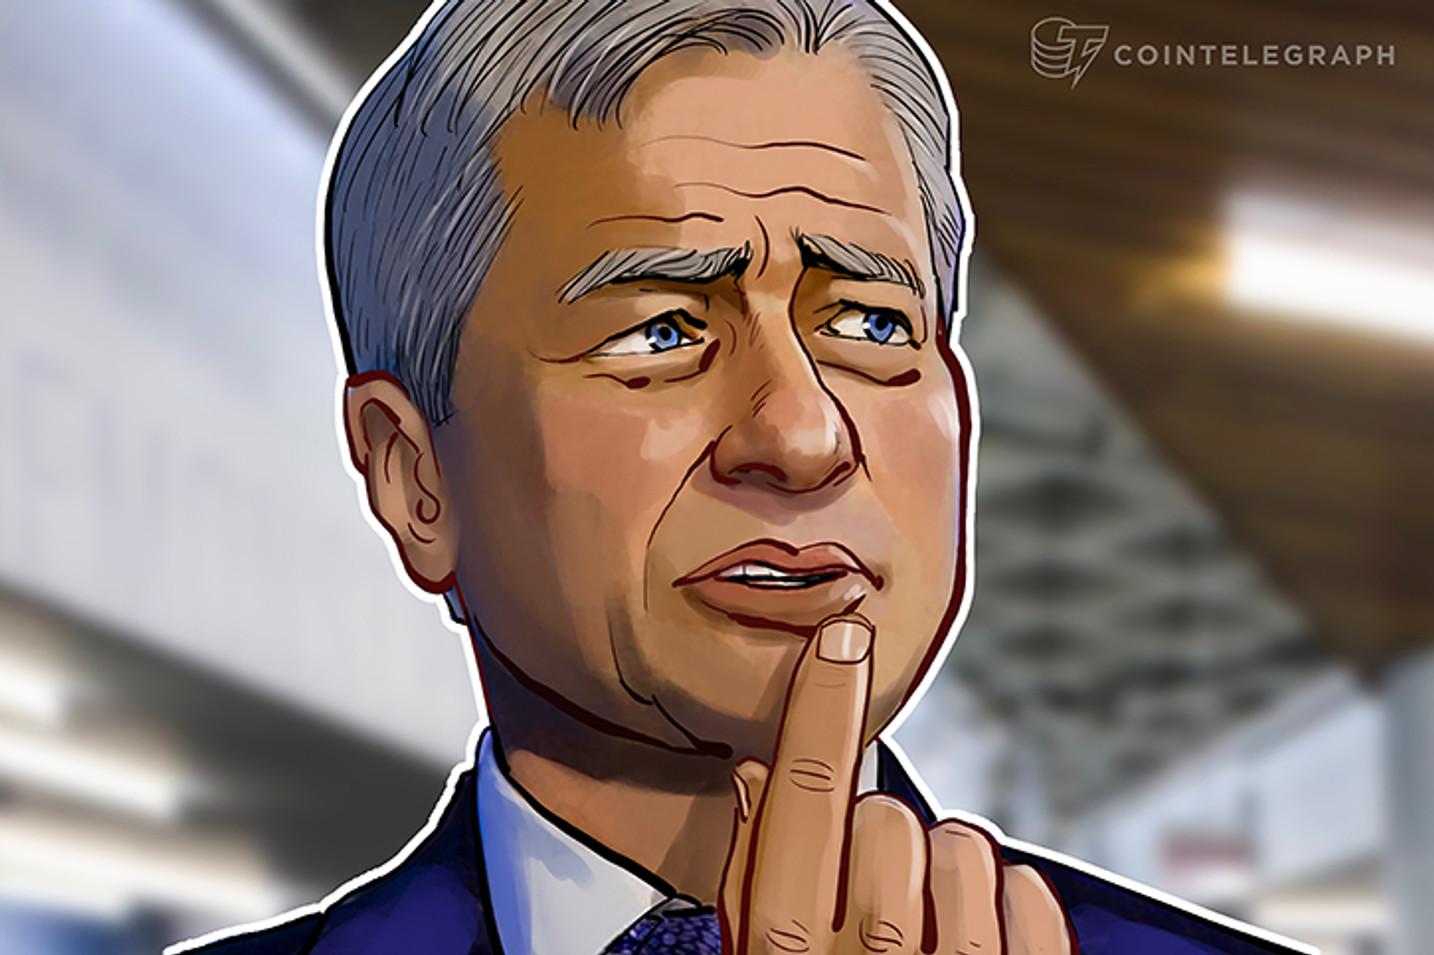 JP Morgan Strategist Says Regulated Futures Markets Give Bitcoin Legitimacy